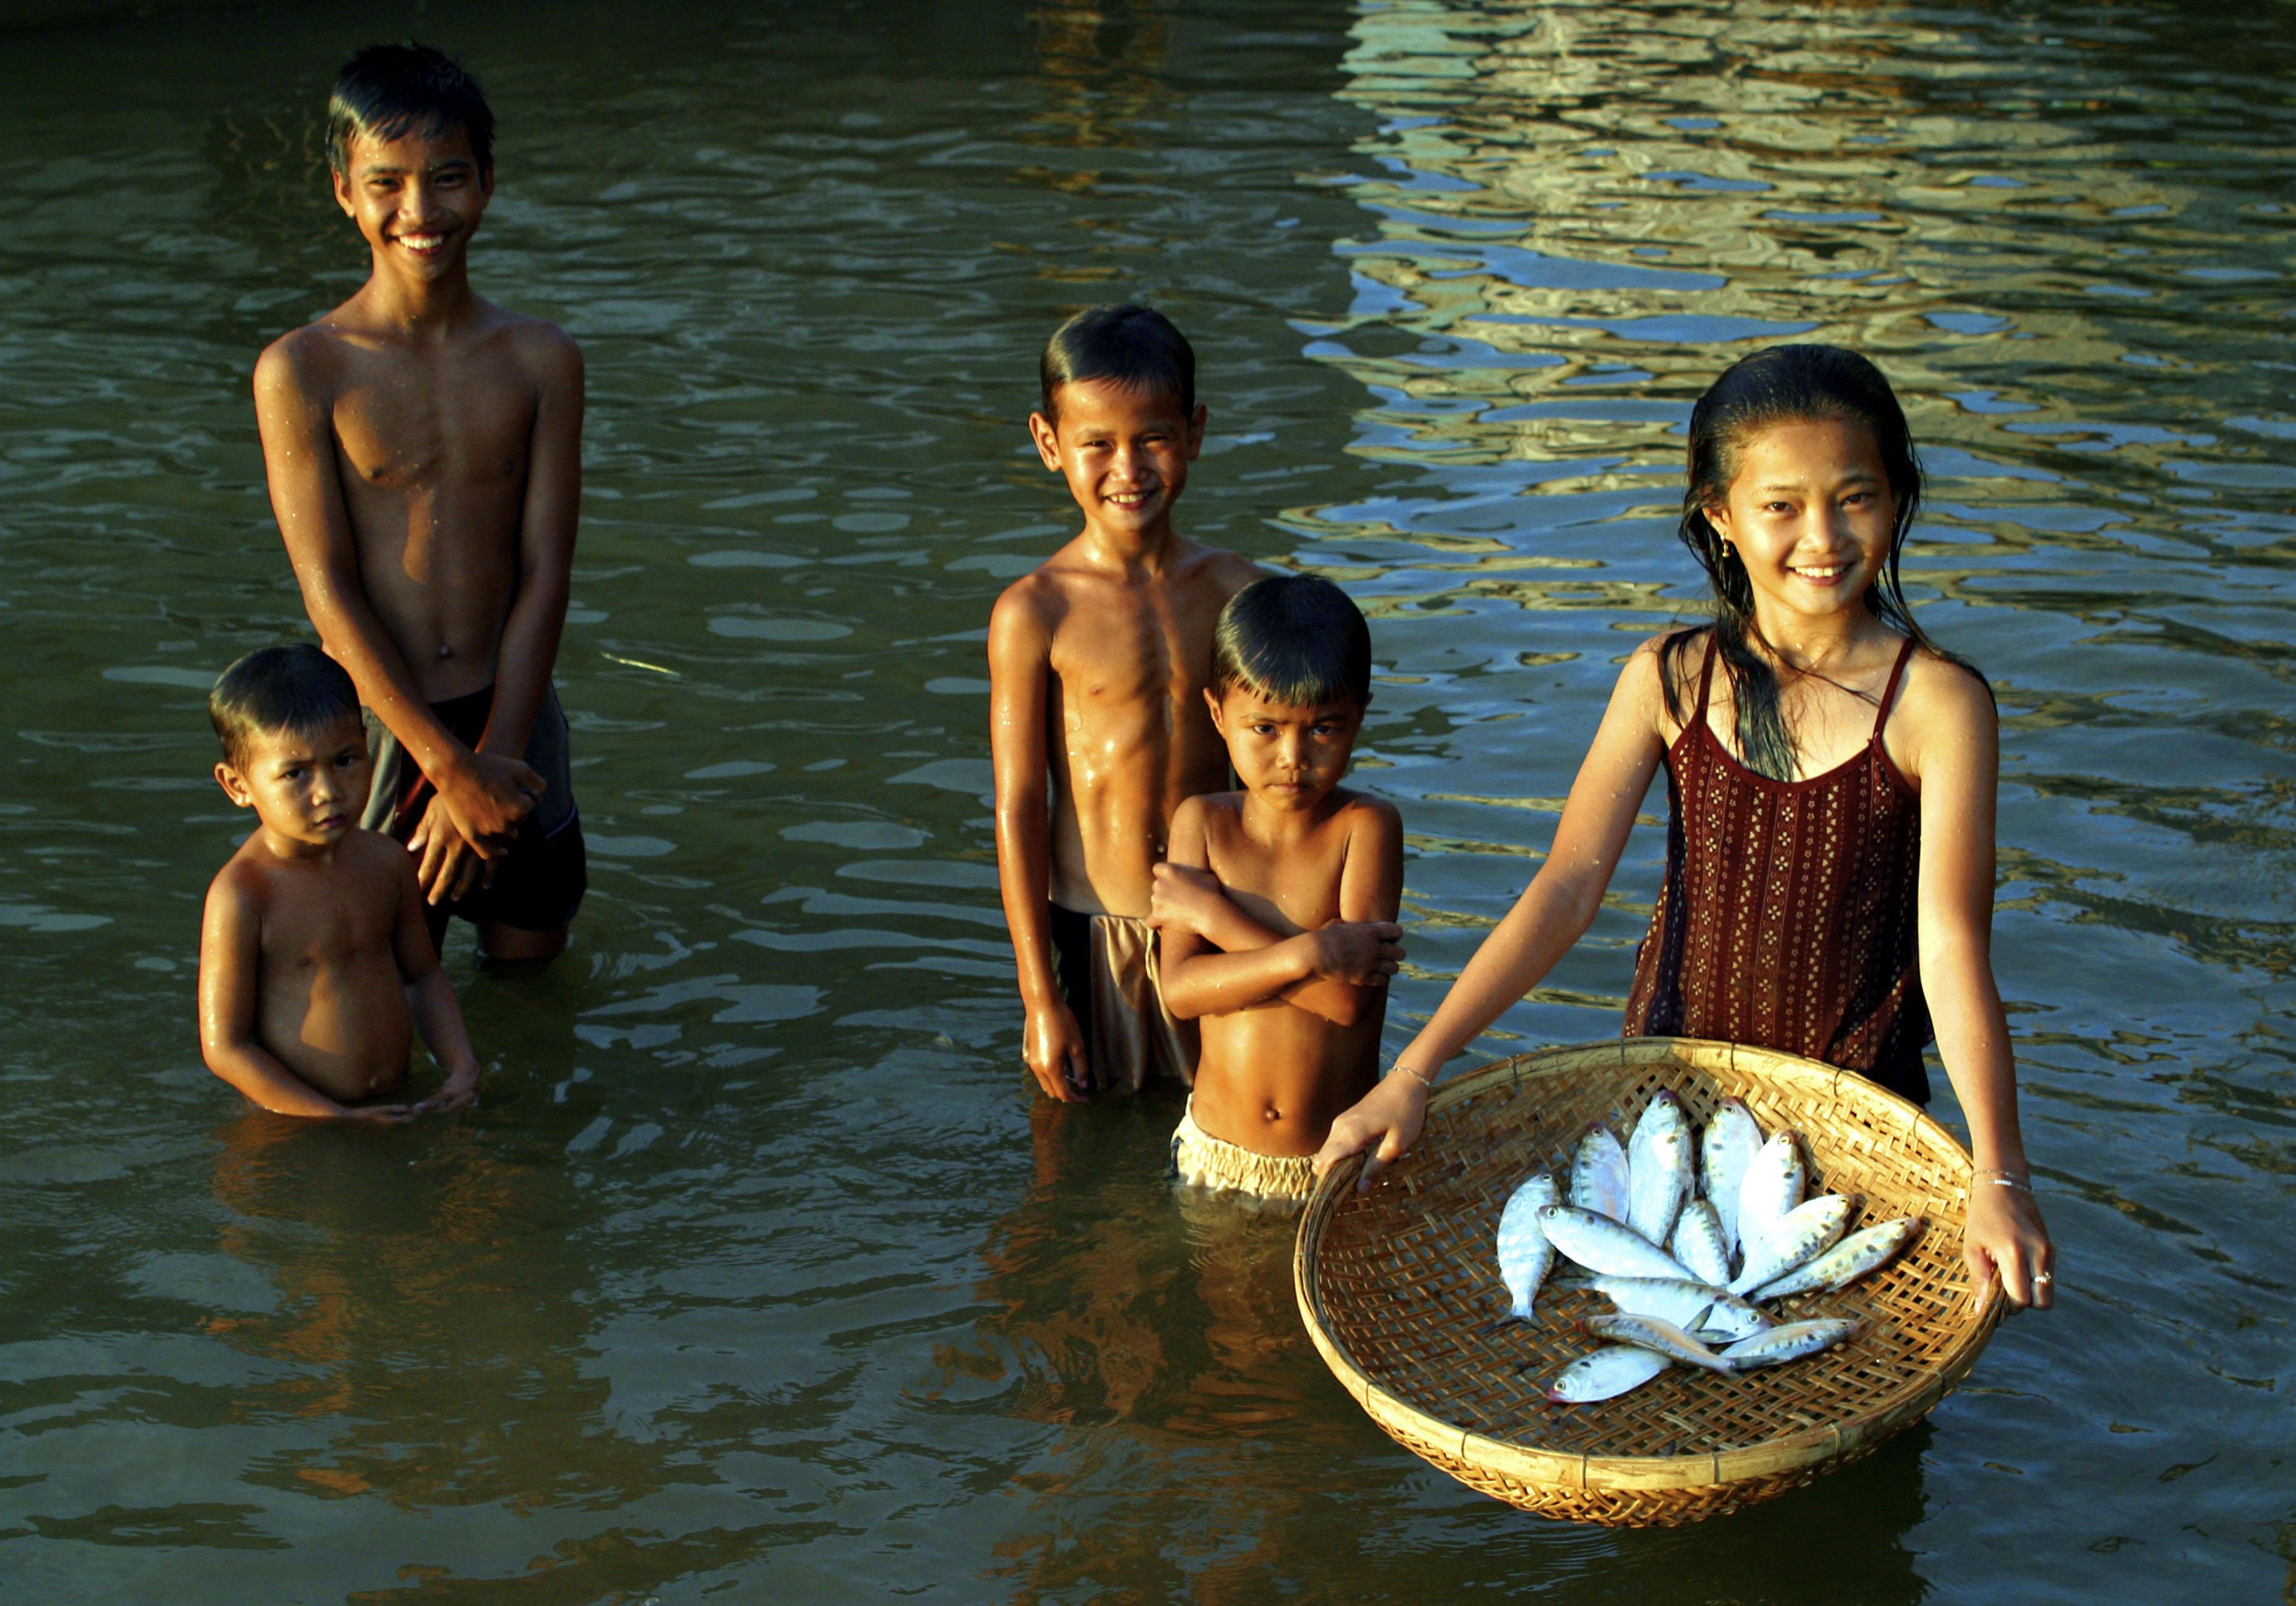 children tonle sap river, mekong shad. © WWF-Canon / Zeb HOGAN